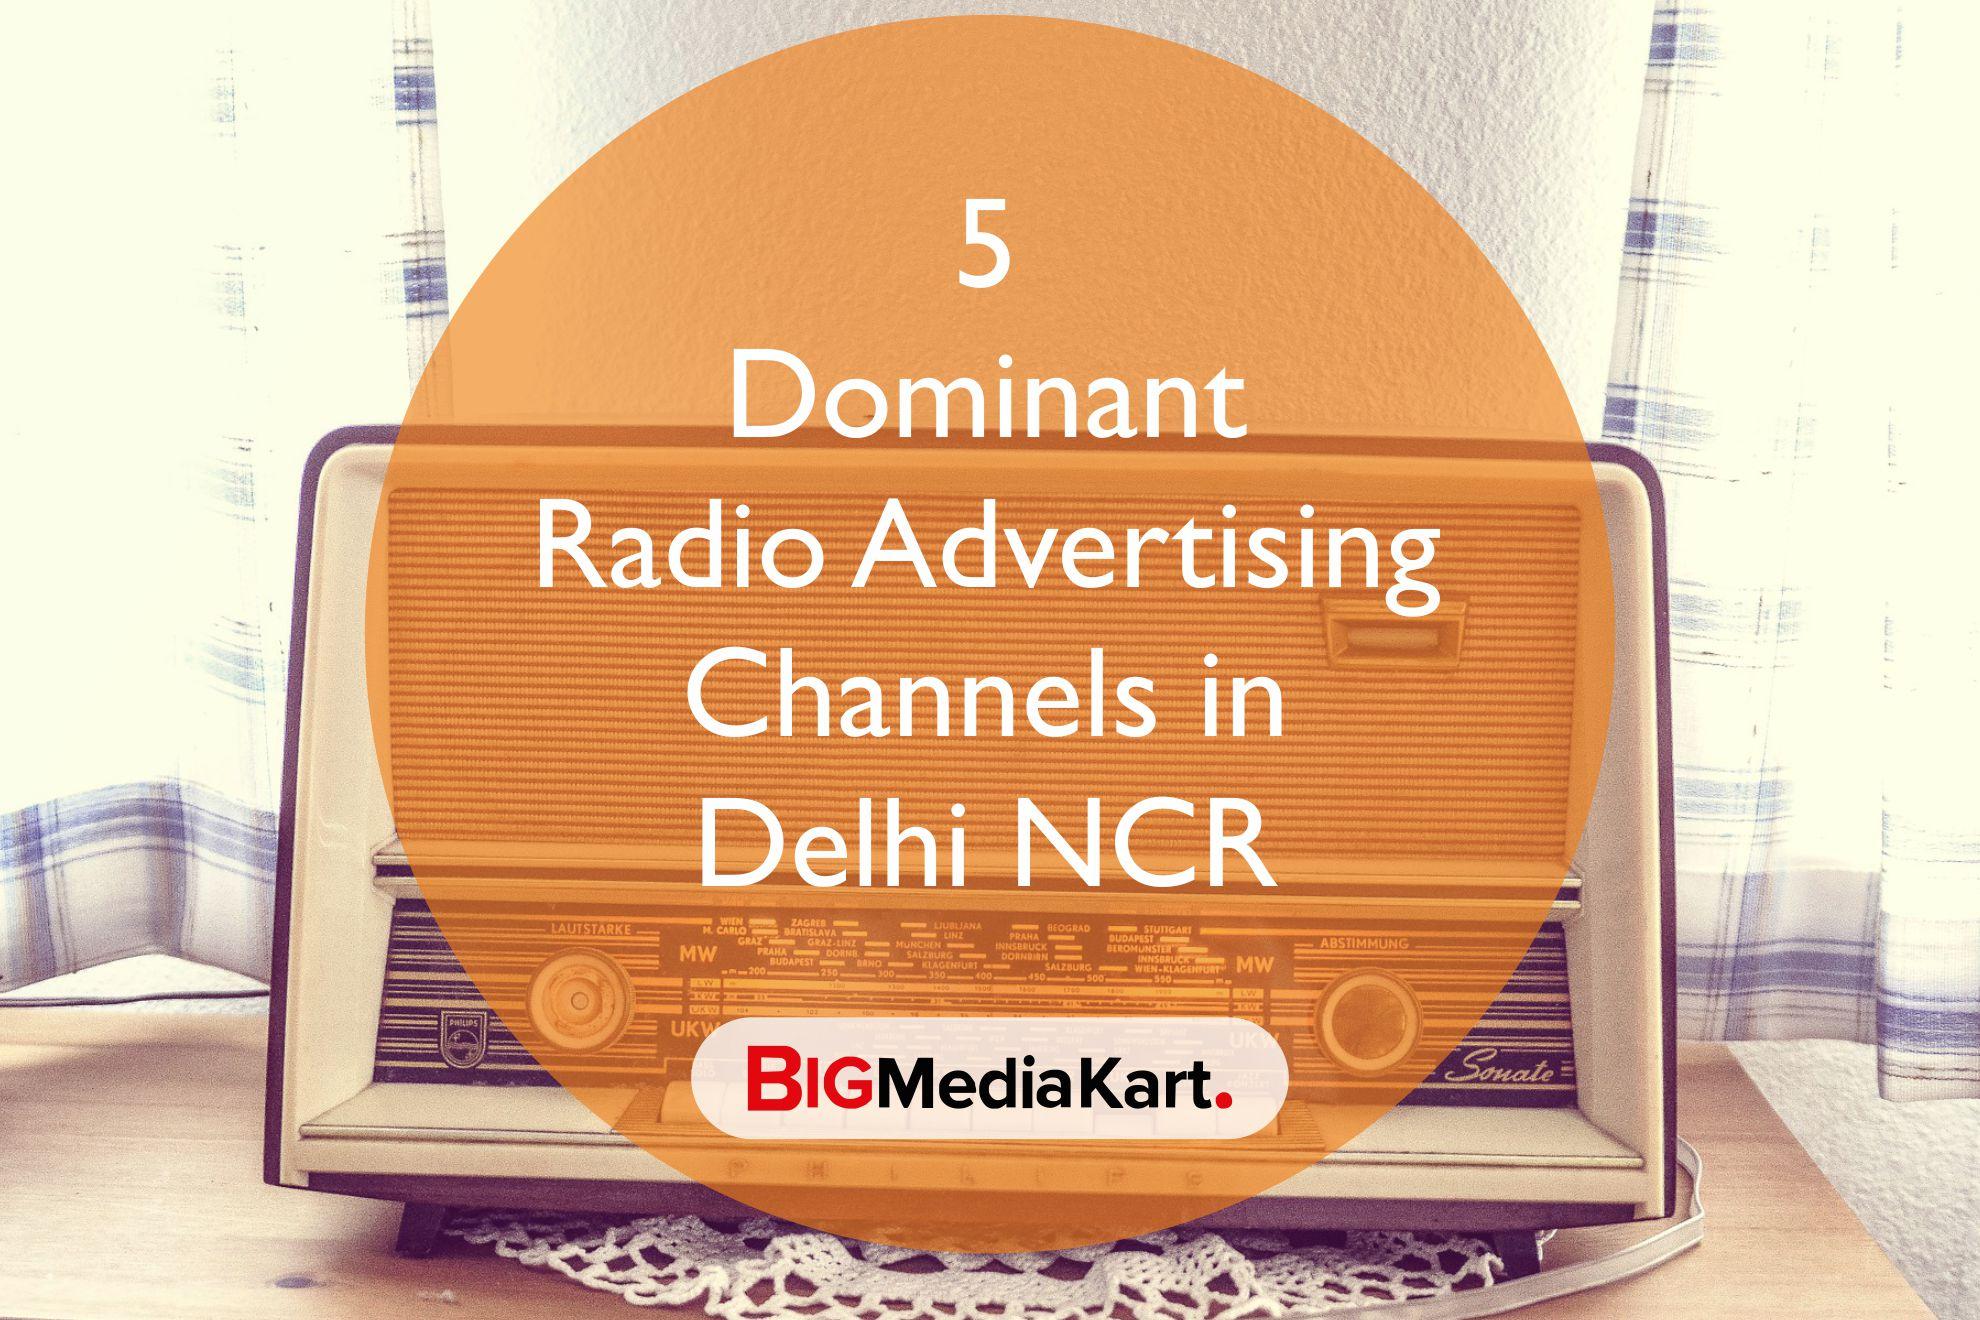 5 Dominant FM Radio Advertising Channels in Delhi NCR